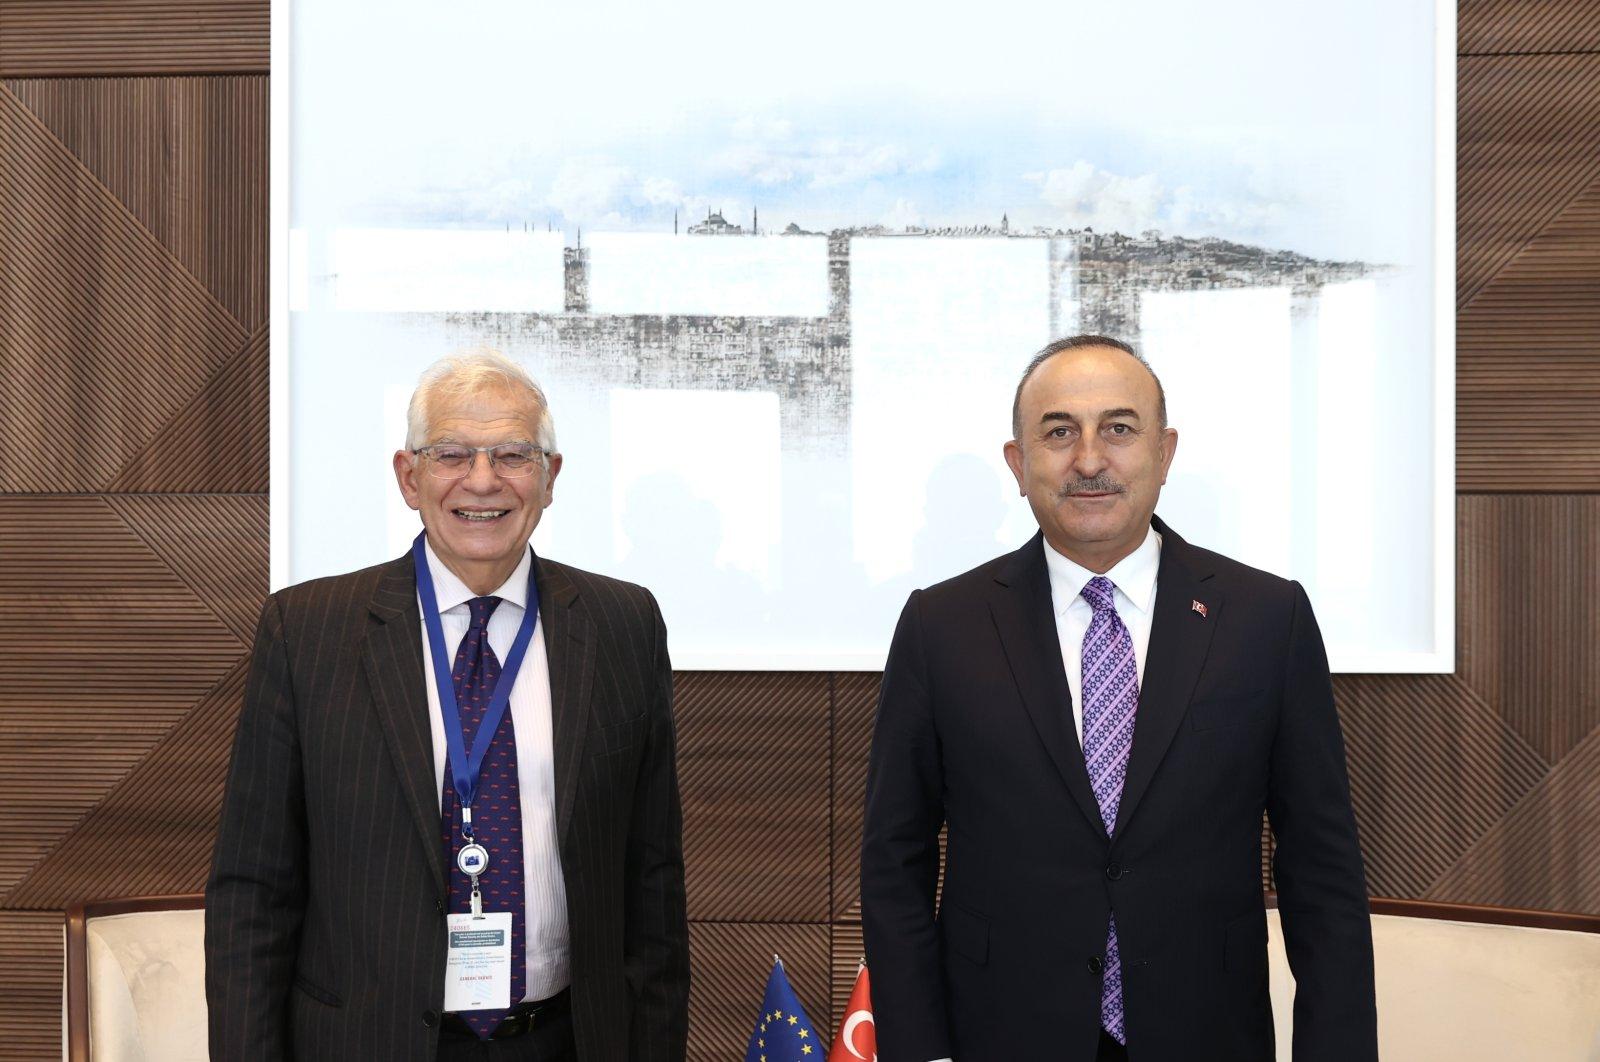 Foreign Minister Mevlüt Çavuşoğlu (R) on Thursday with Josep Borrell, the EU foreign affairs chief on the sidelines of the UNGA in New York, U.S., Sept. 23, 2021 (AA Photo)